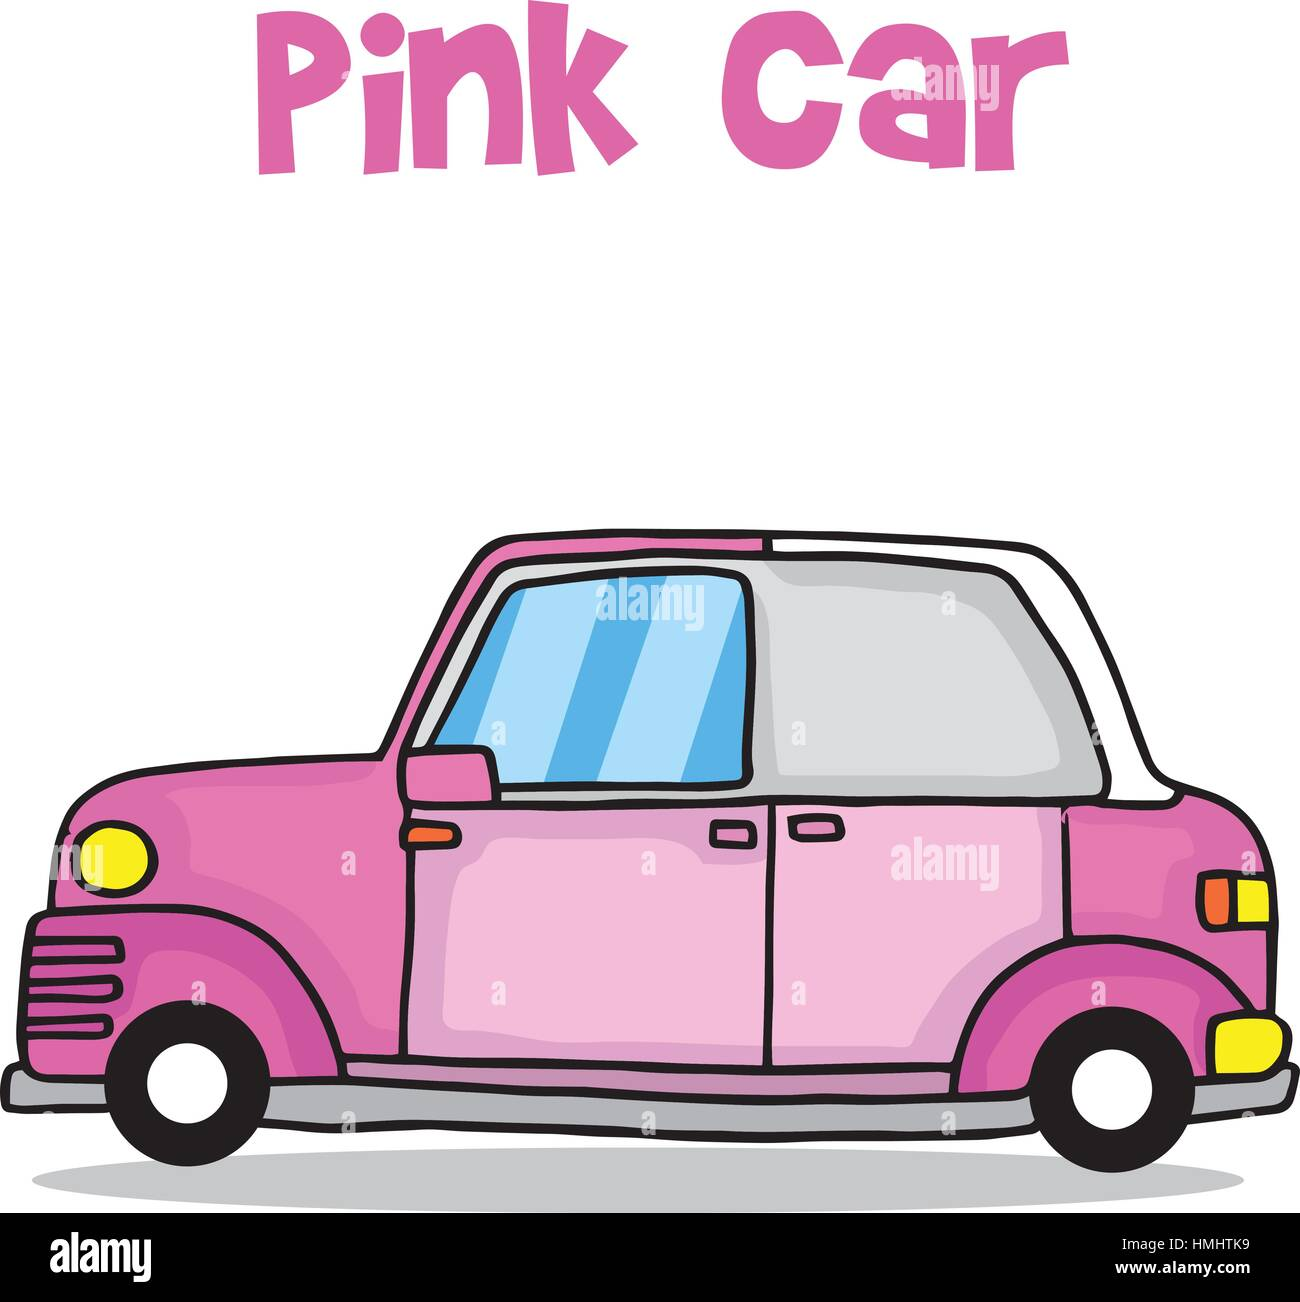 Transport of pink car vector illustration - Stock Vector